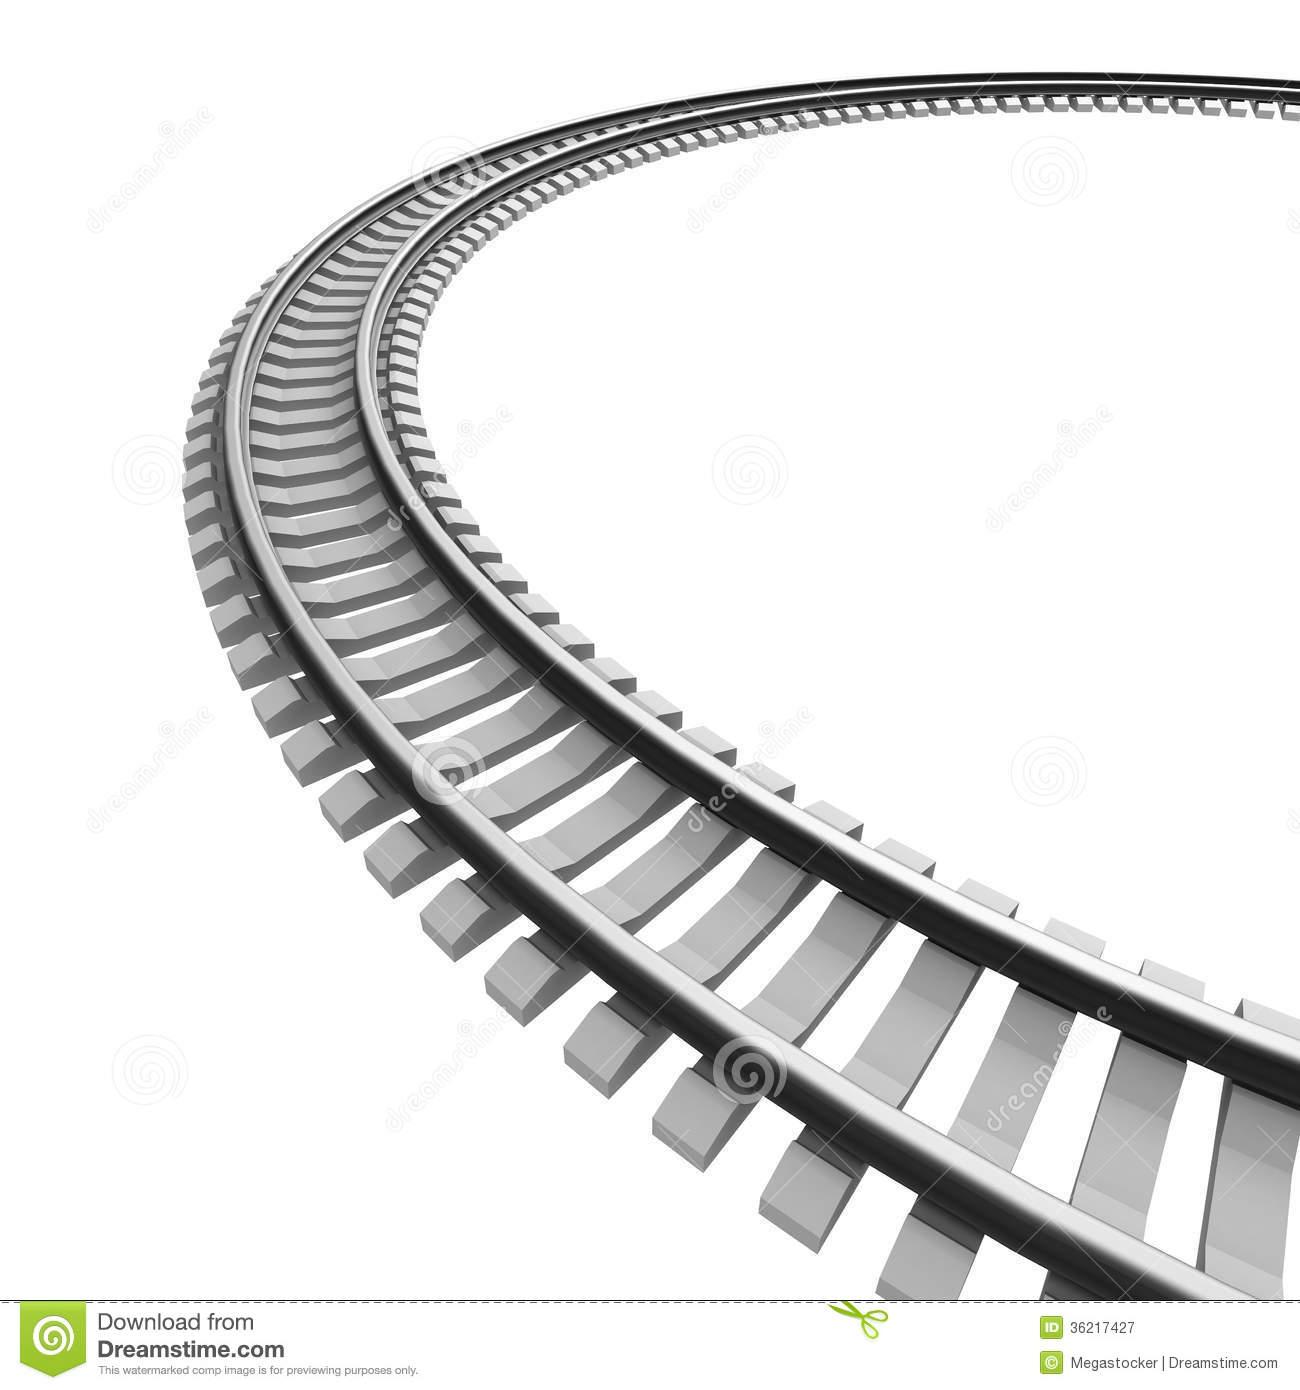 Railway track hd clipart.